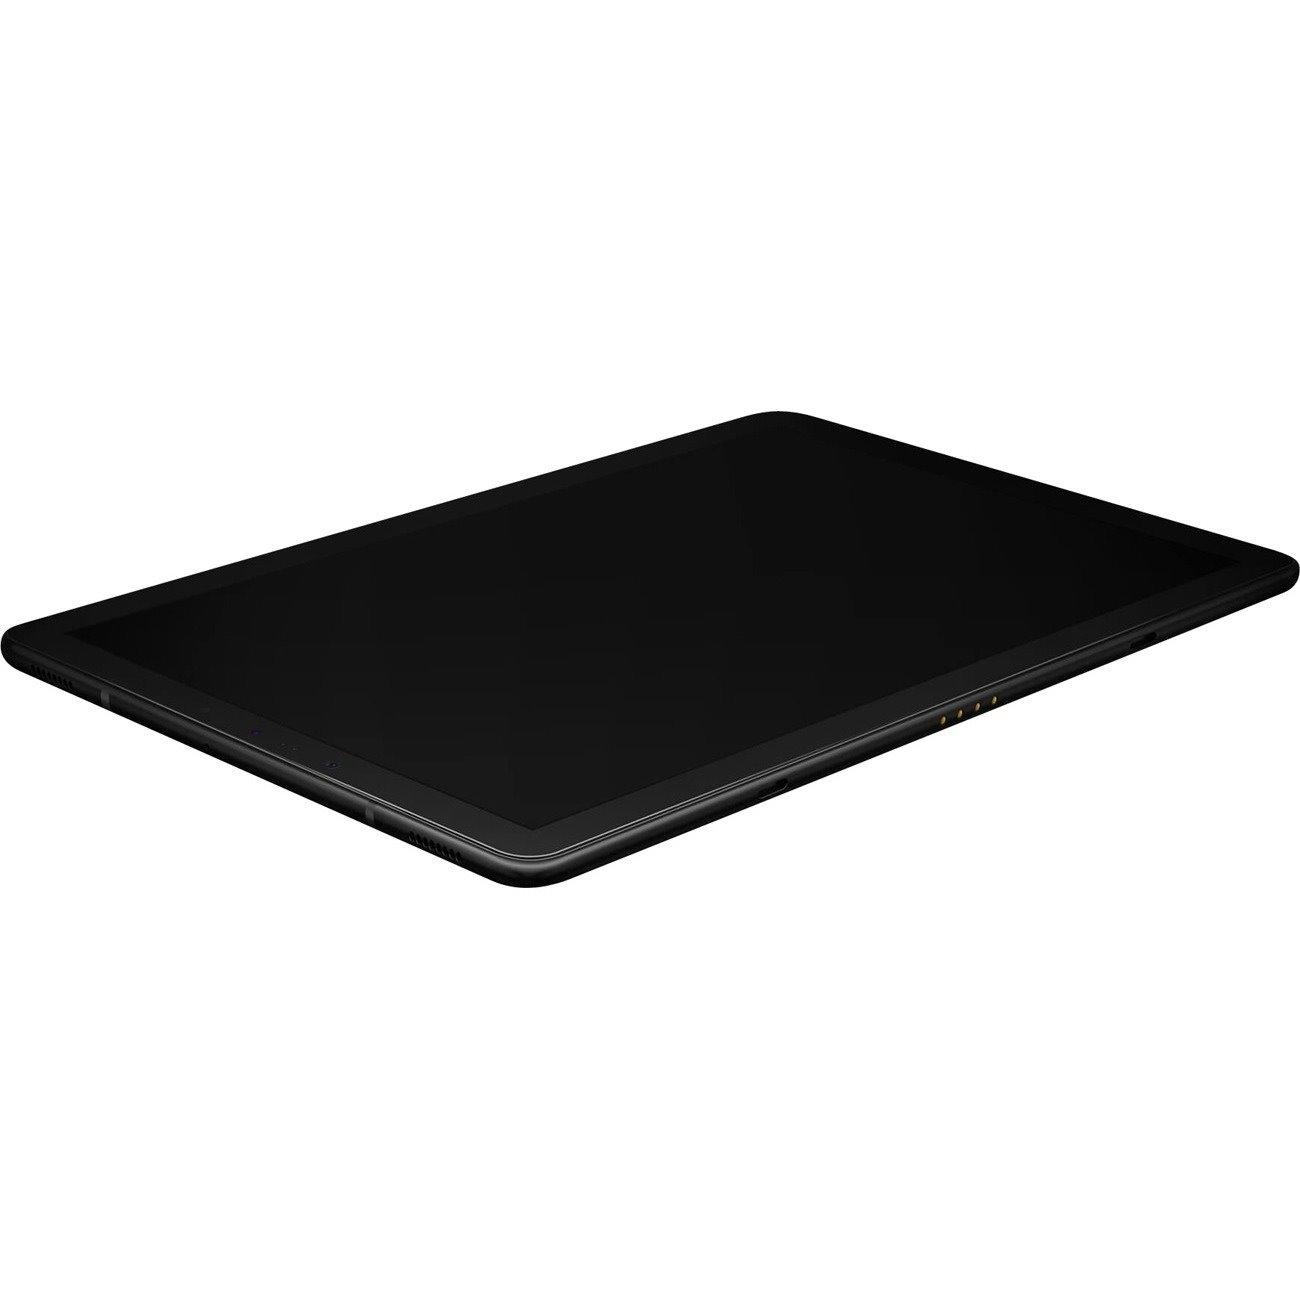 Buy Samsung Galaxy Tab S4 SM-T830 Tablet - 26 7 cm (10 5